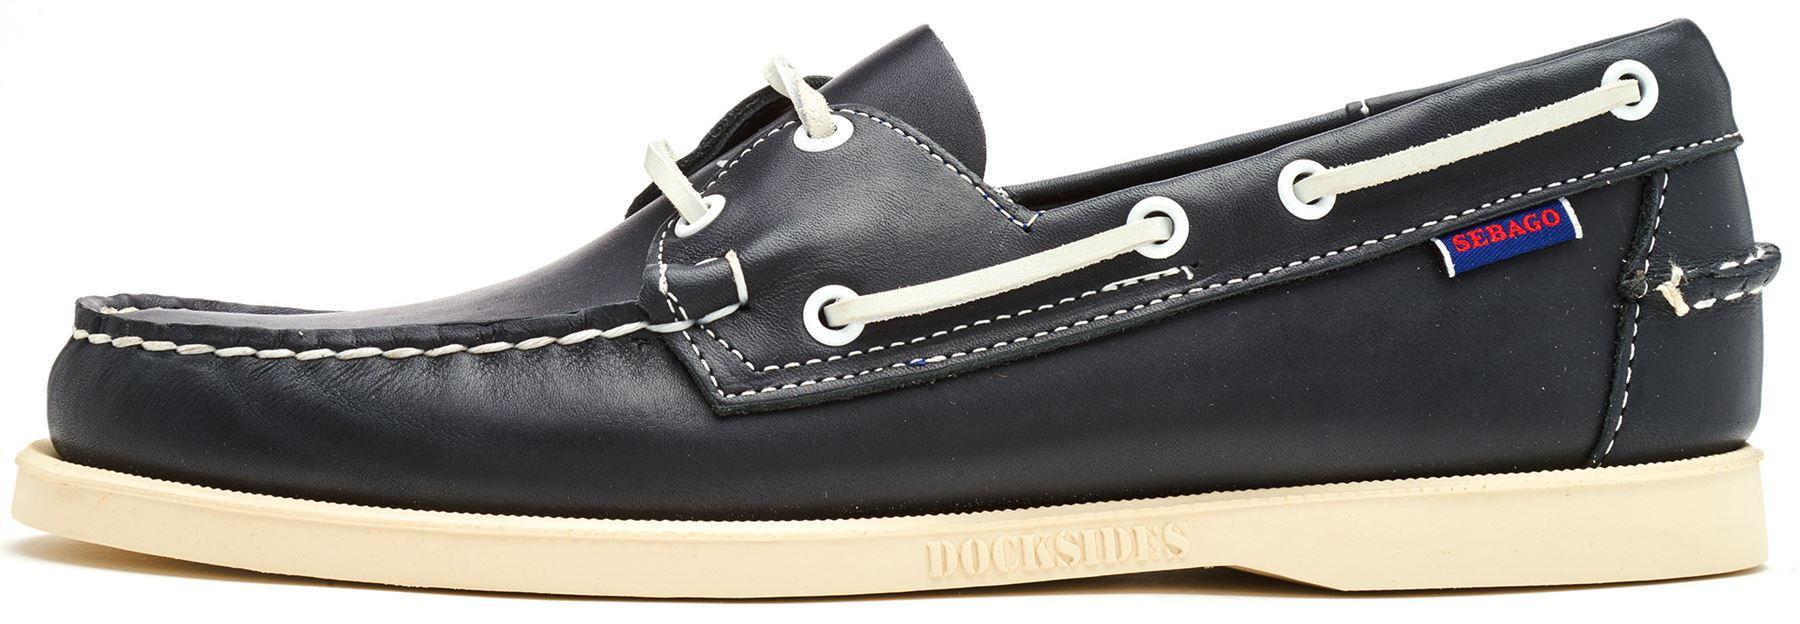 Sebago-Docksides-NBK-Suede-Boat-Deck-Shoes-in-Navy-Blue-amp-Coral-amp-Dark-Brown thumbnail 22